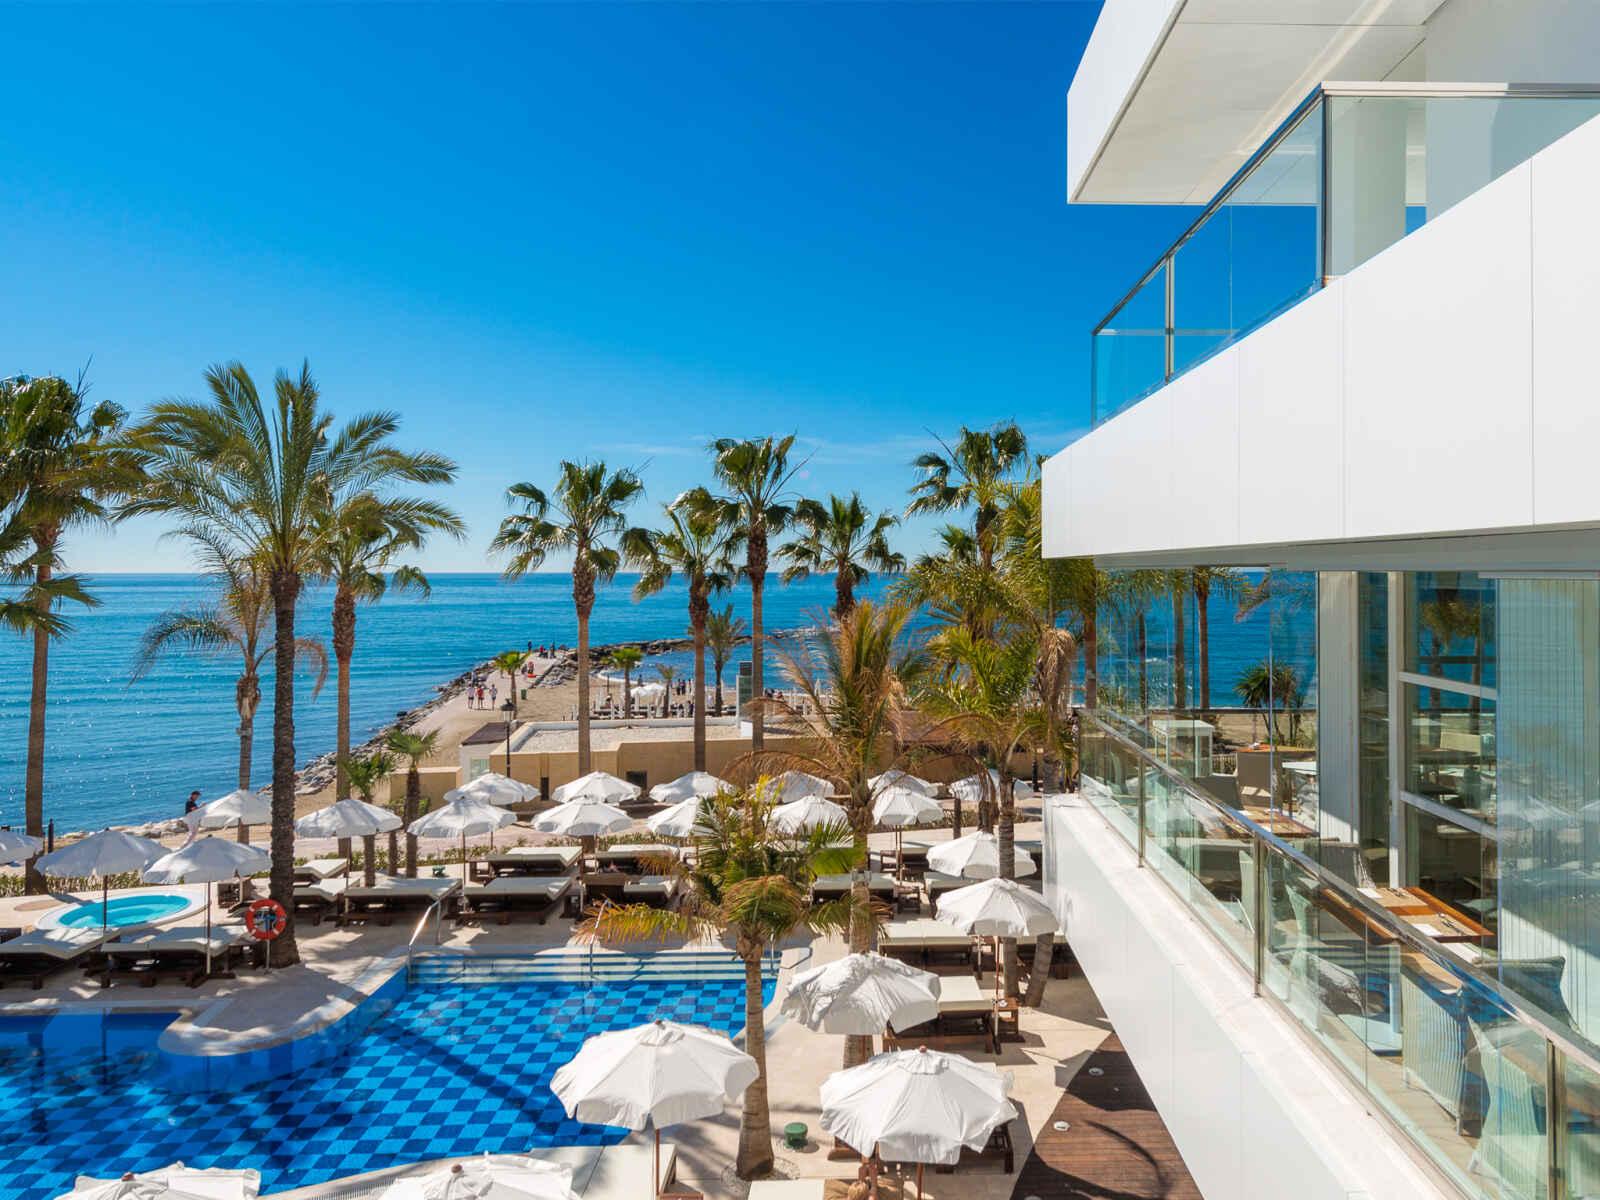 Séjour Espagne - Amàre Beach Hotel Marbella - 4*